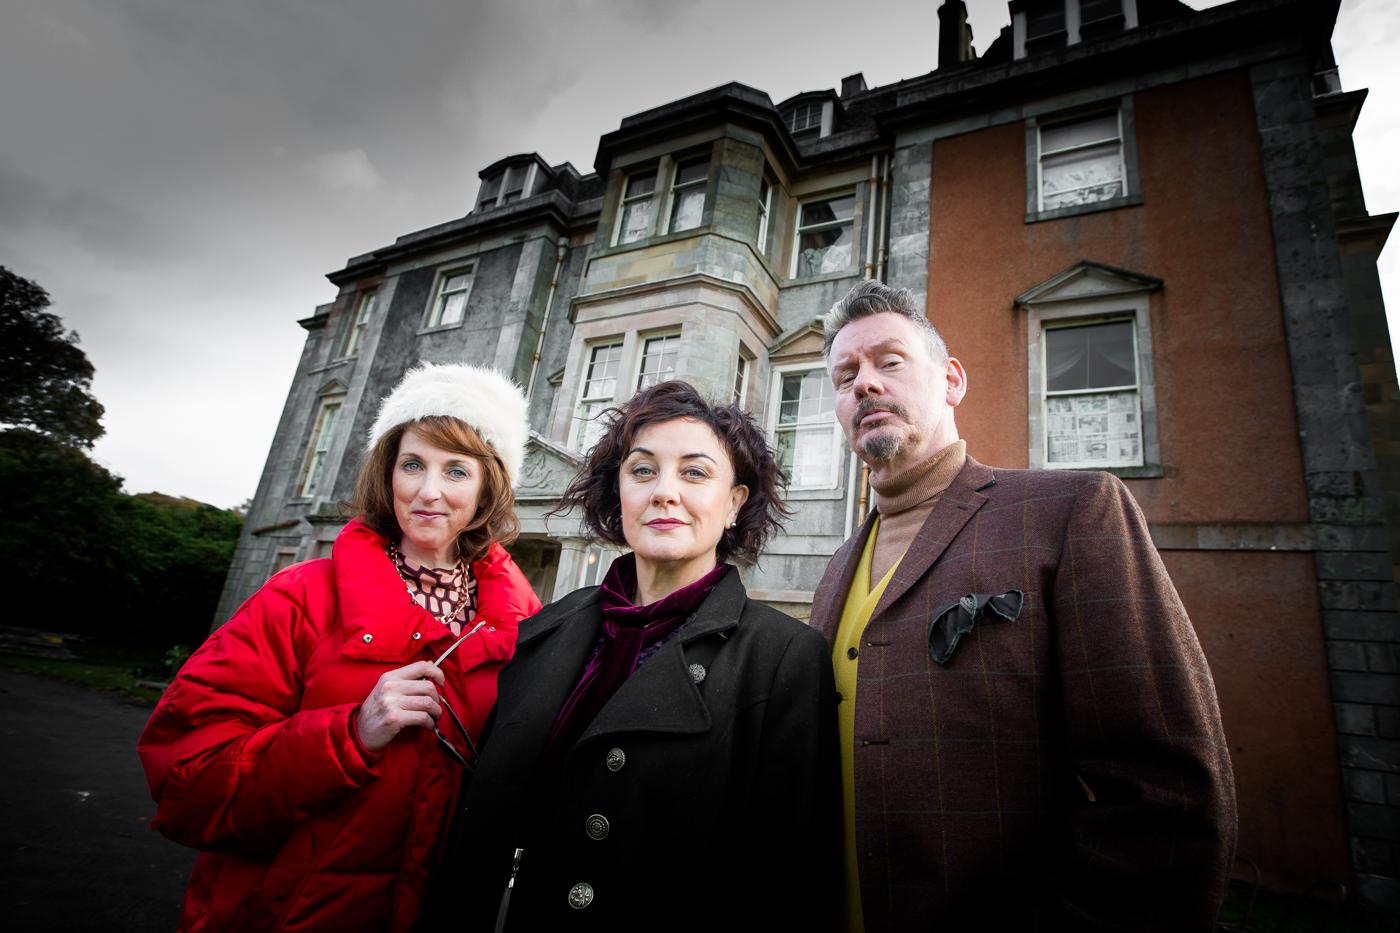 The Ghost Haunt team: Producer Dom (Wilson Nimmo) Faye Bowers (McIntosh) Pat Tomorrow (Gordon Sinclair)